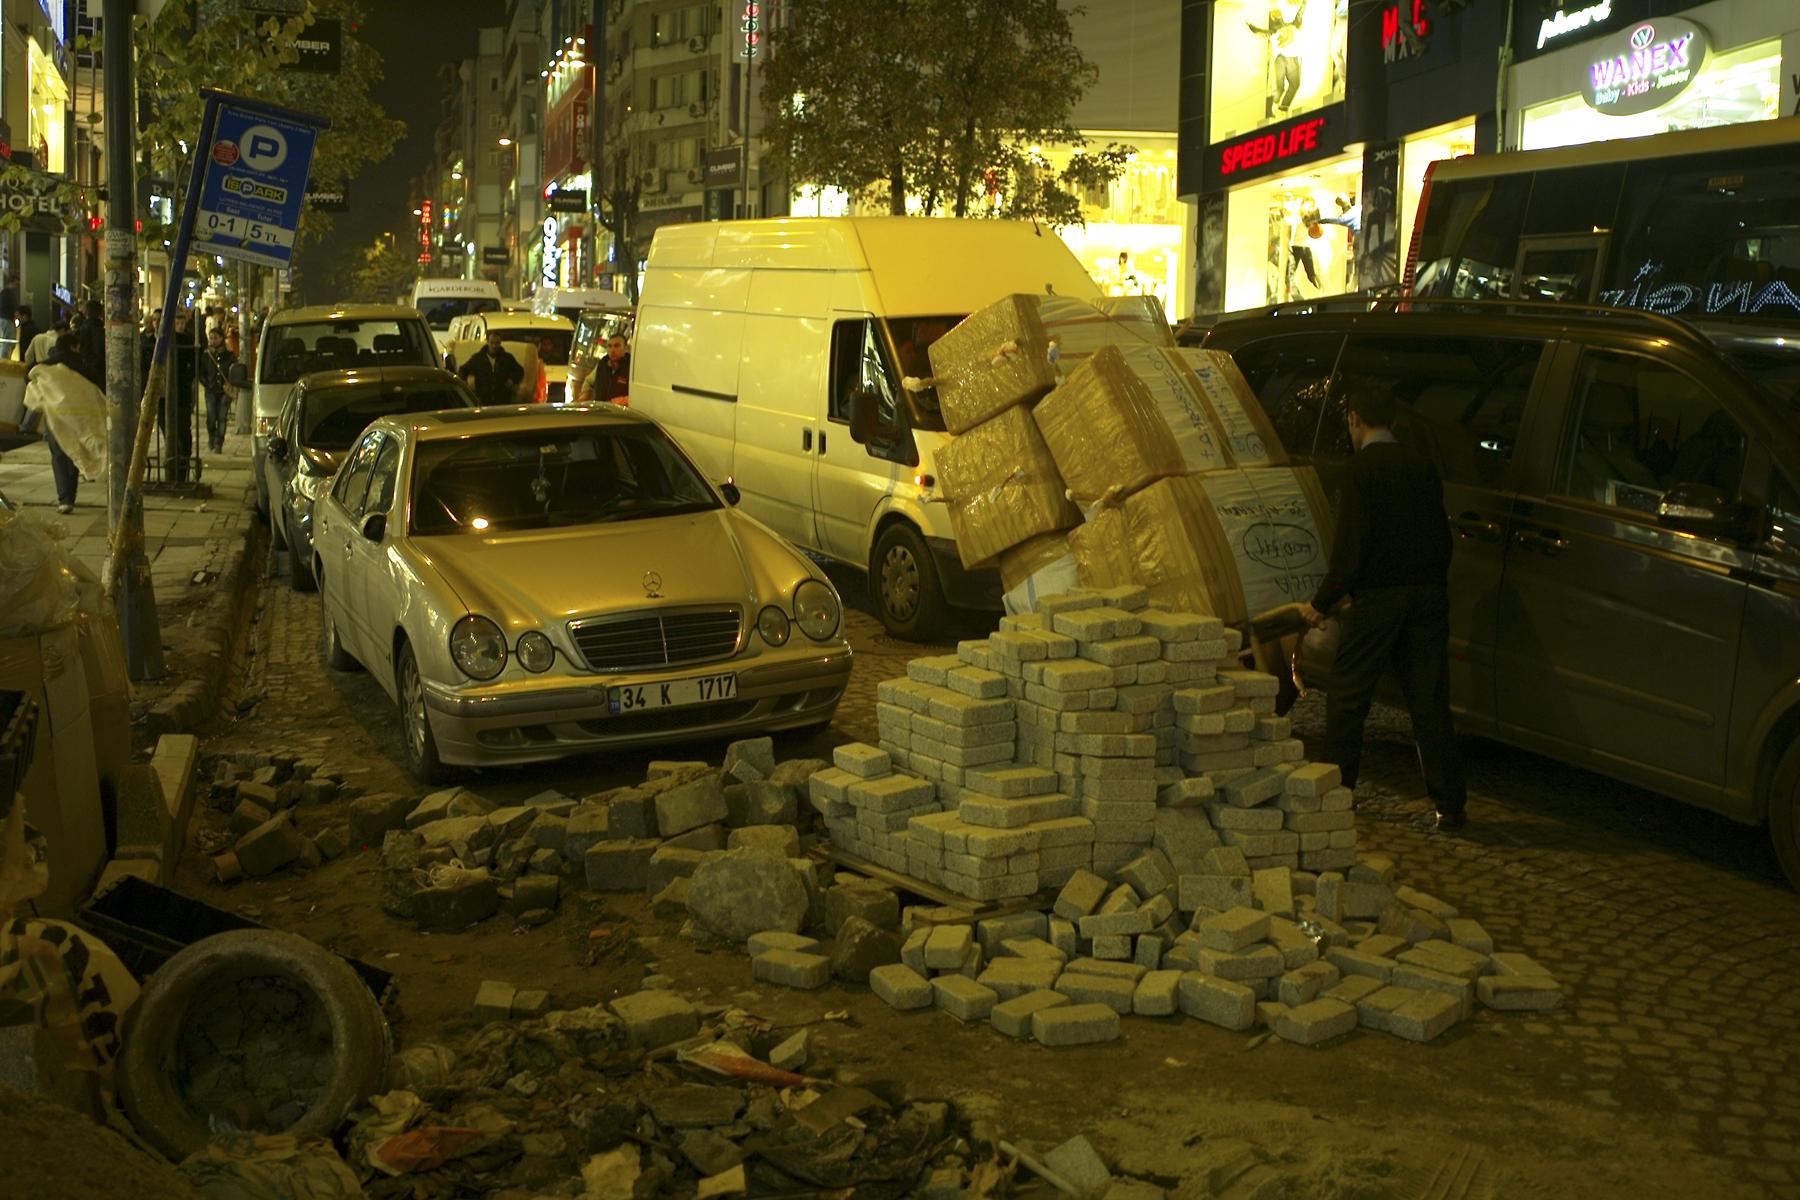 L1001684/ Стамбул, ноябрь 2011